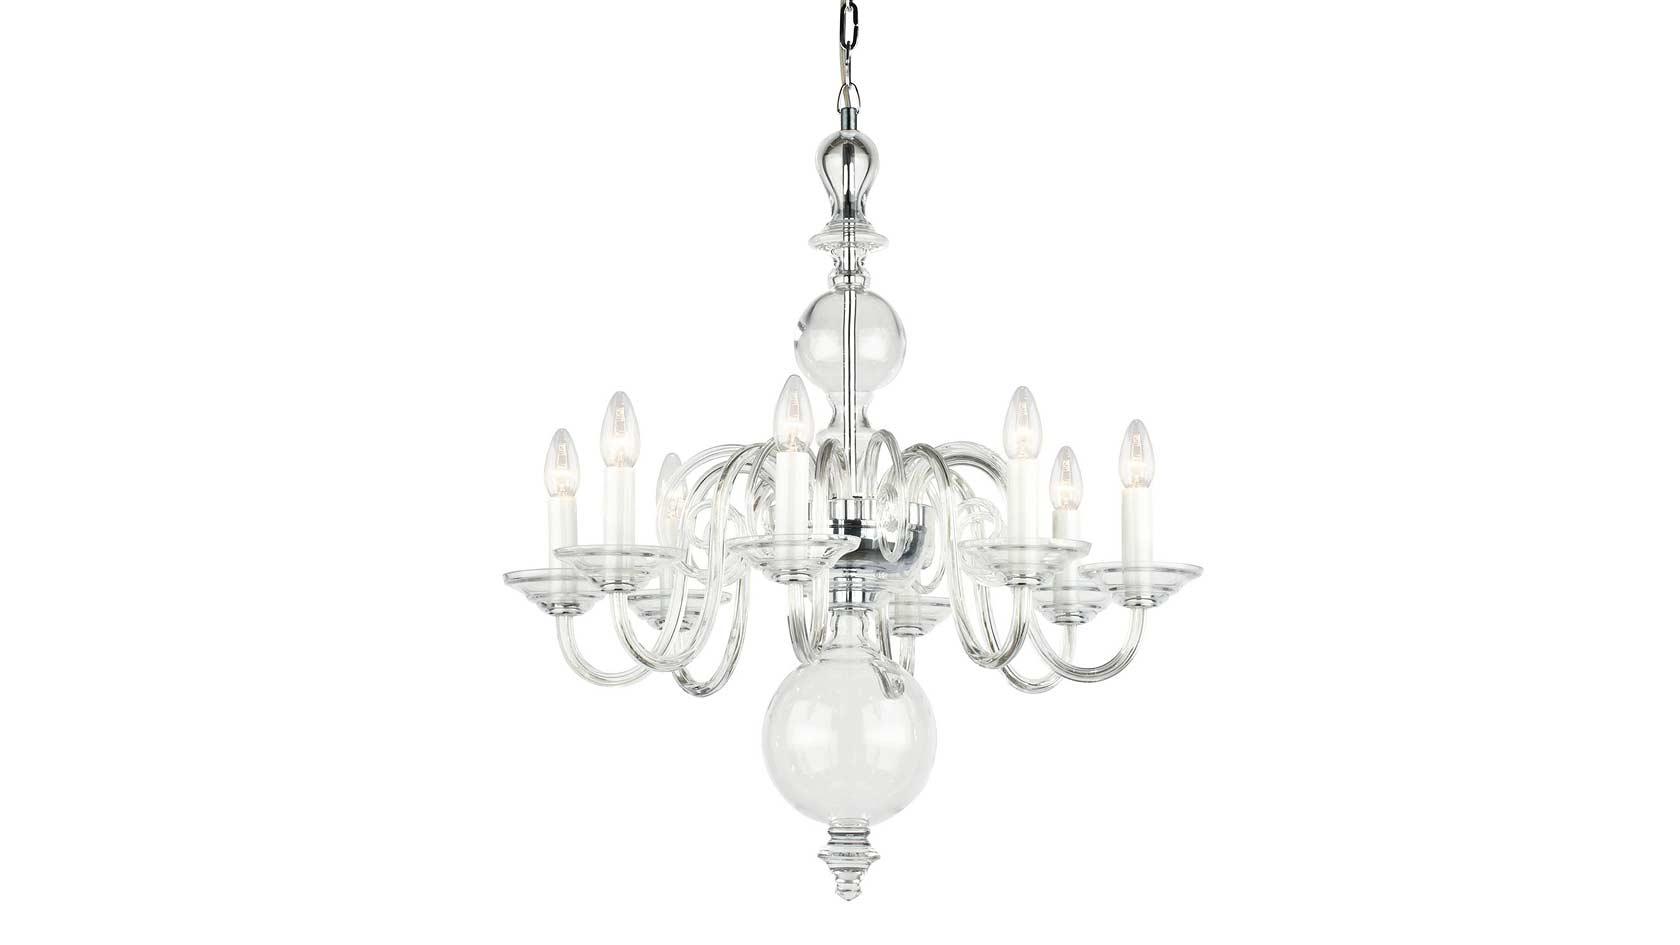 Plush Home_tulip-8-arm-chandelier_Crystal